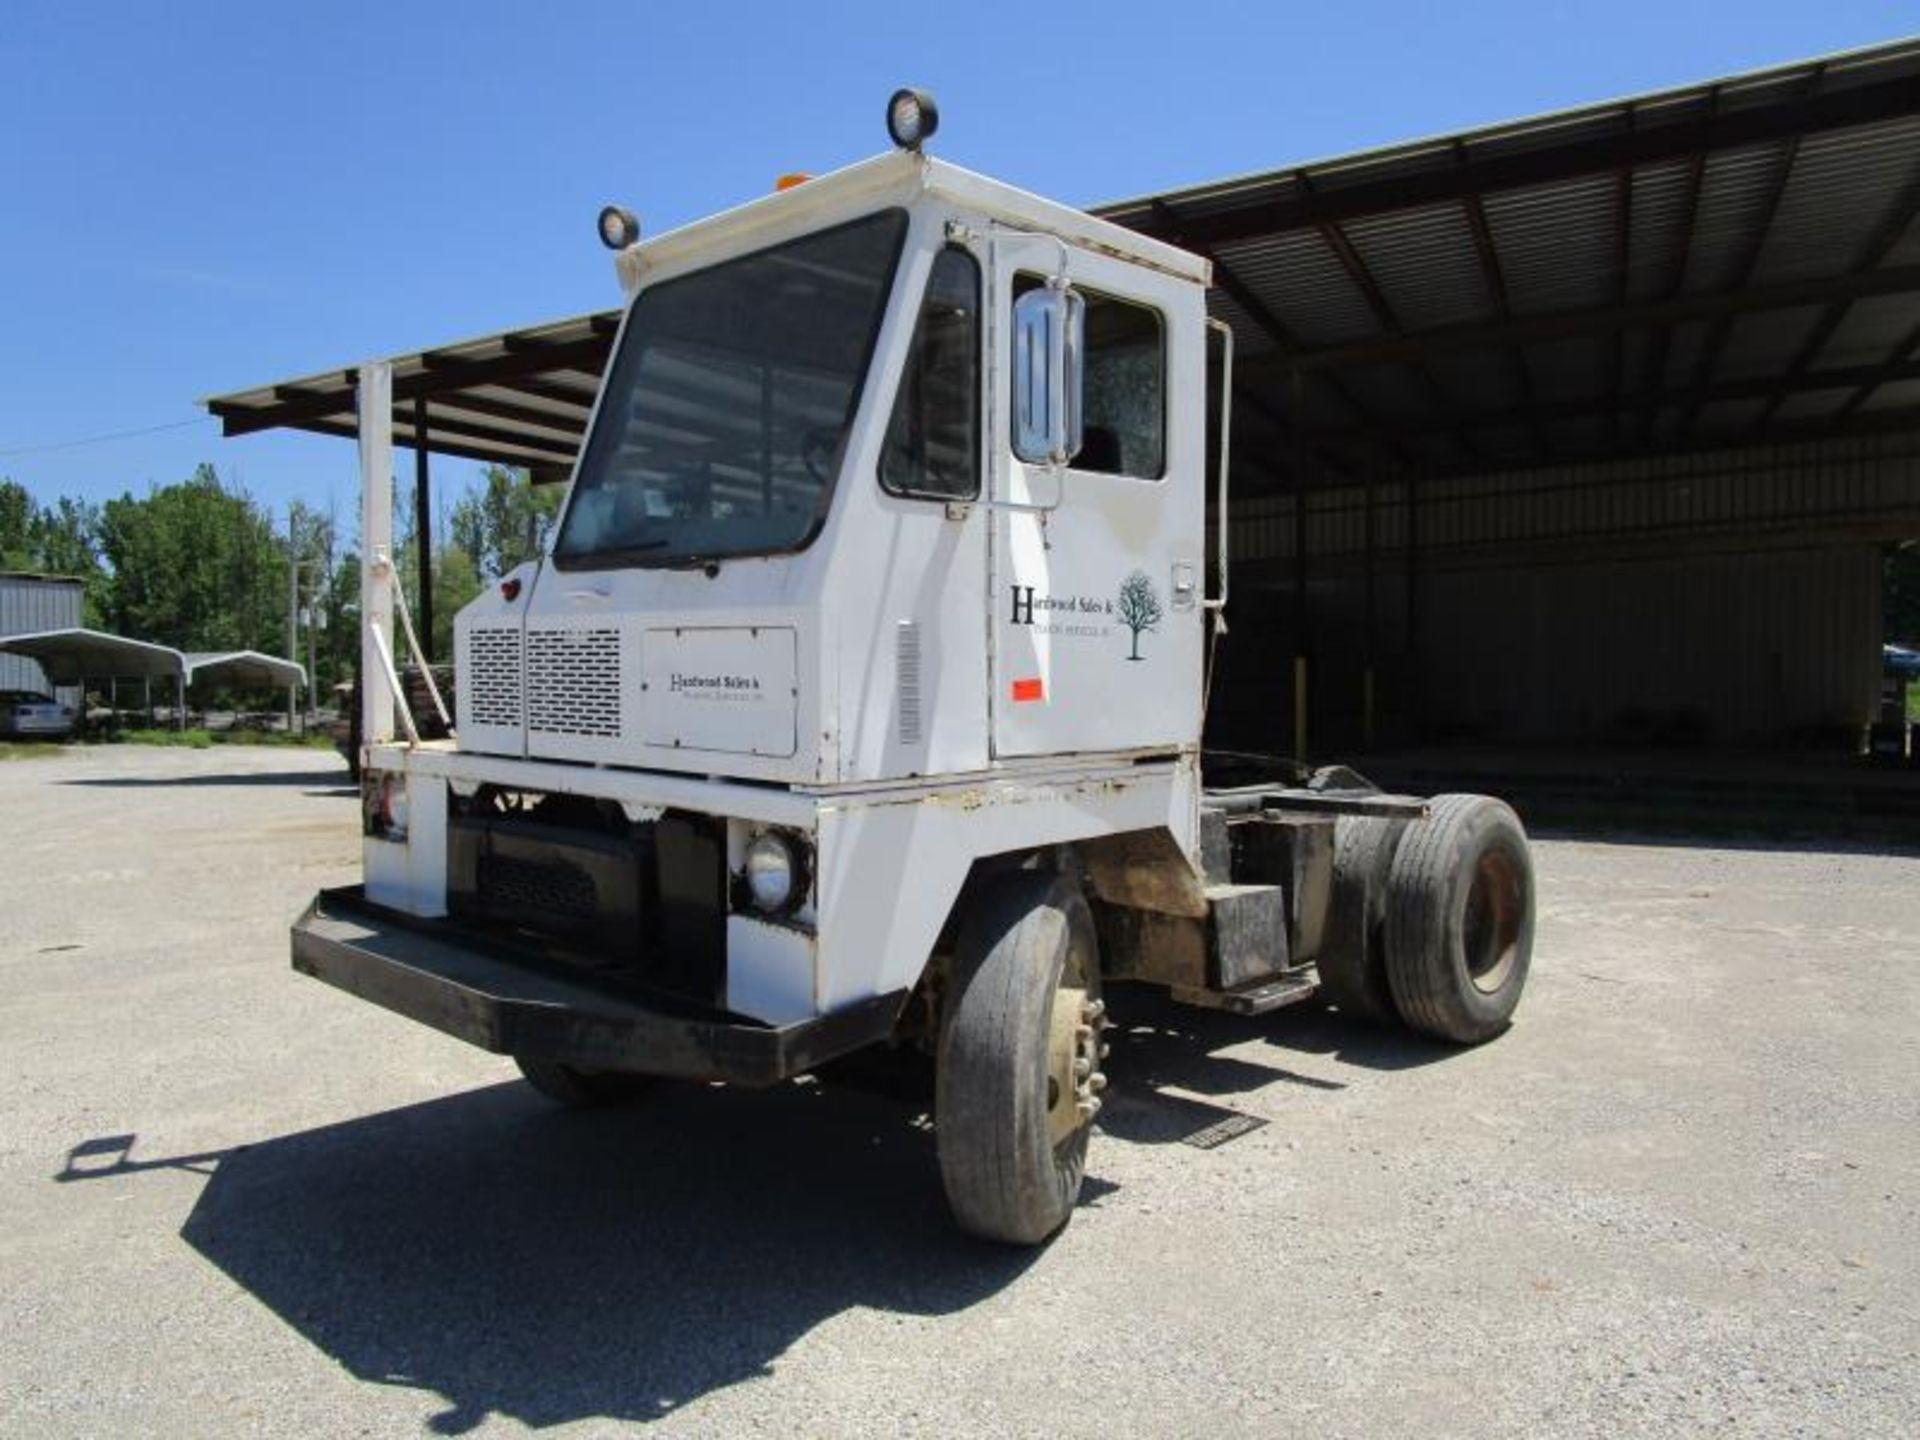 Yard truck by Ottawa truck model# 30 SN: 65044390 engine hours 8,164